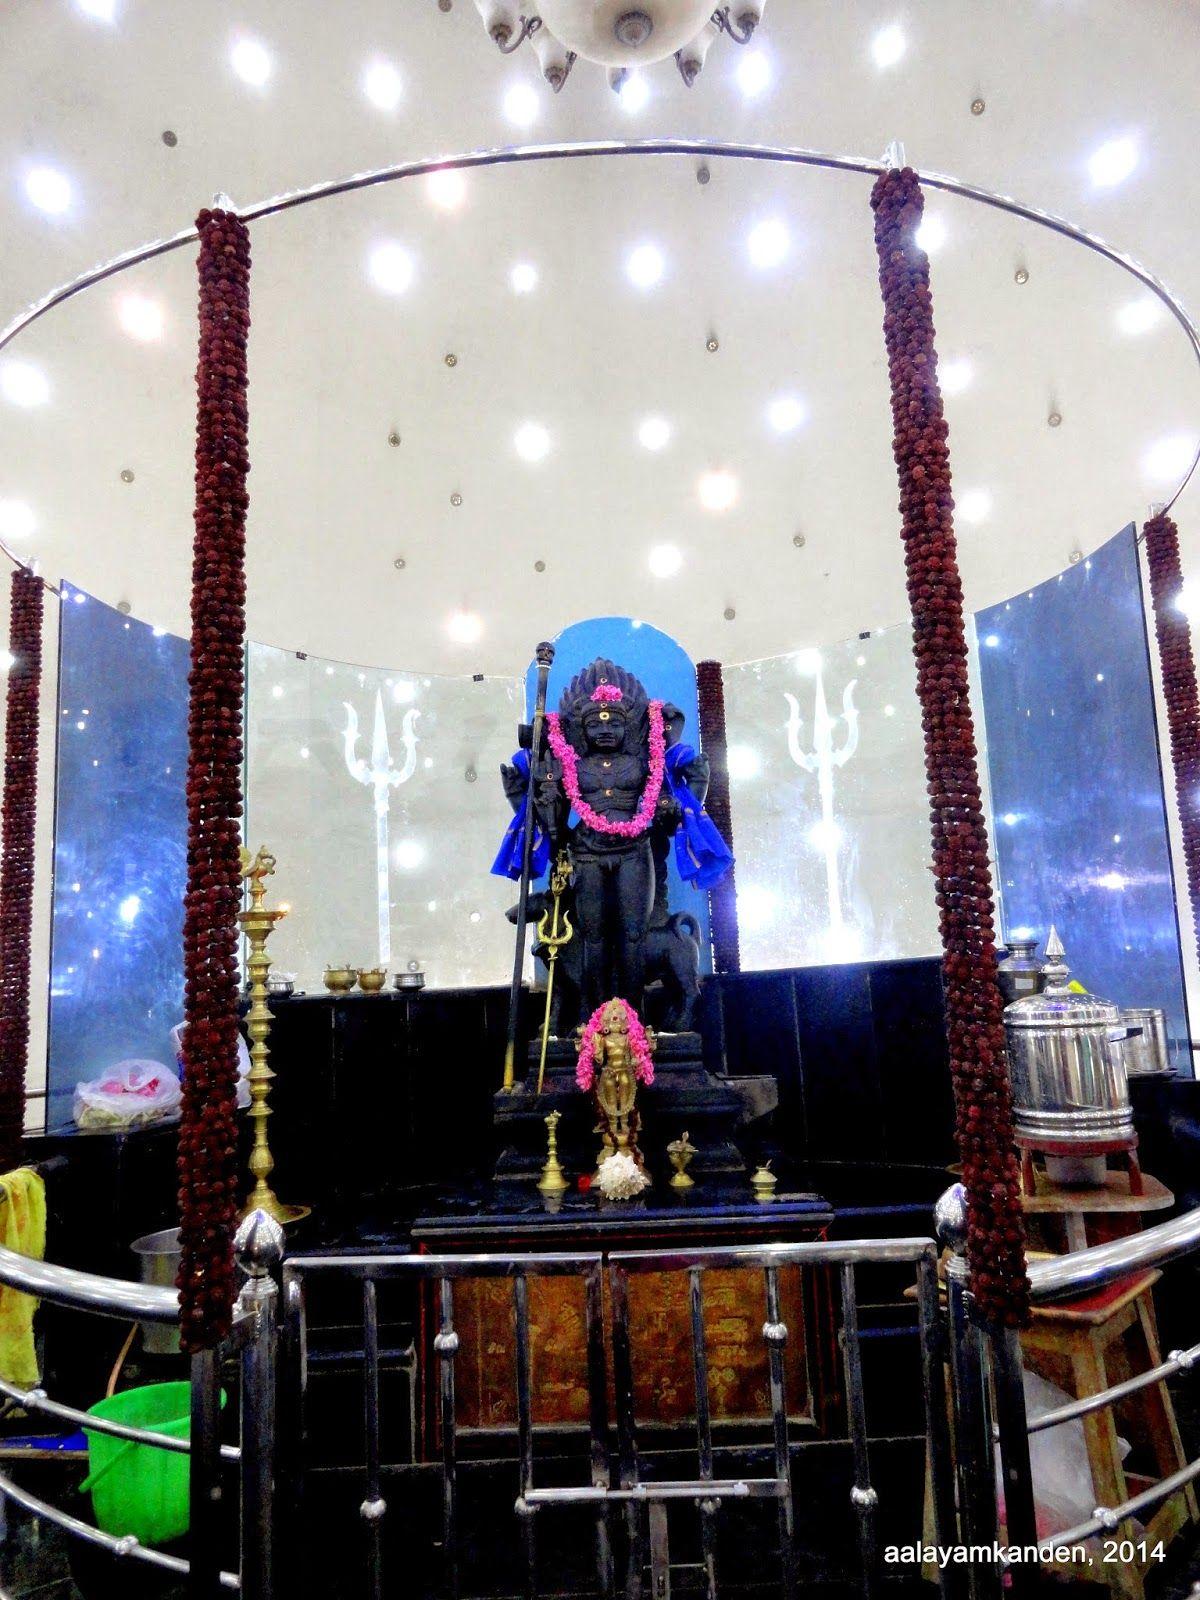 nagathamman temple in bangalore dating